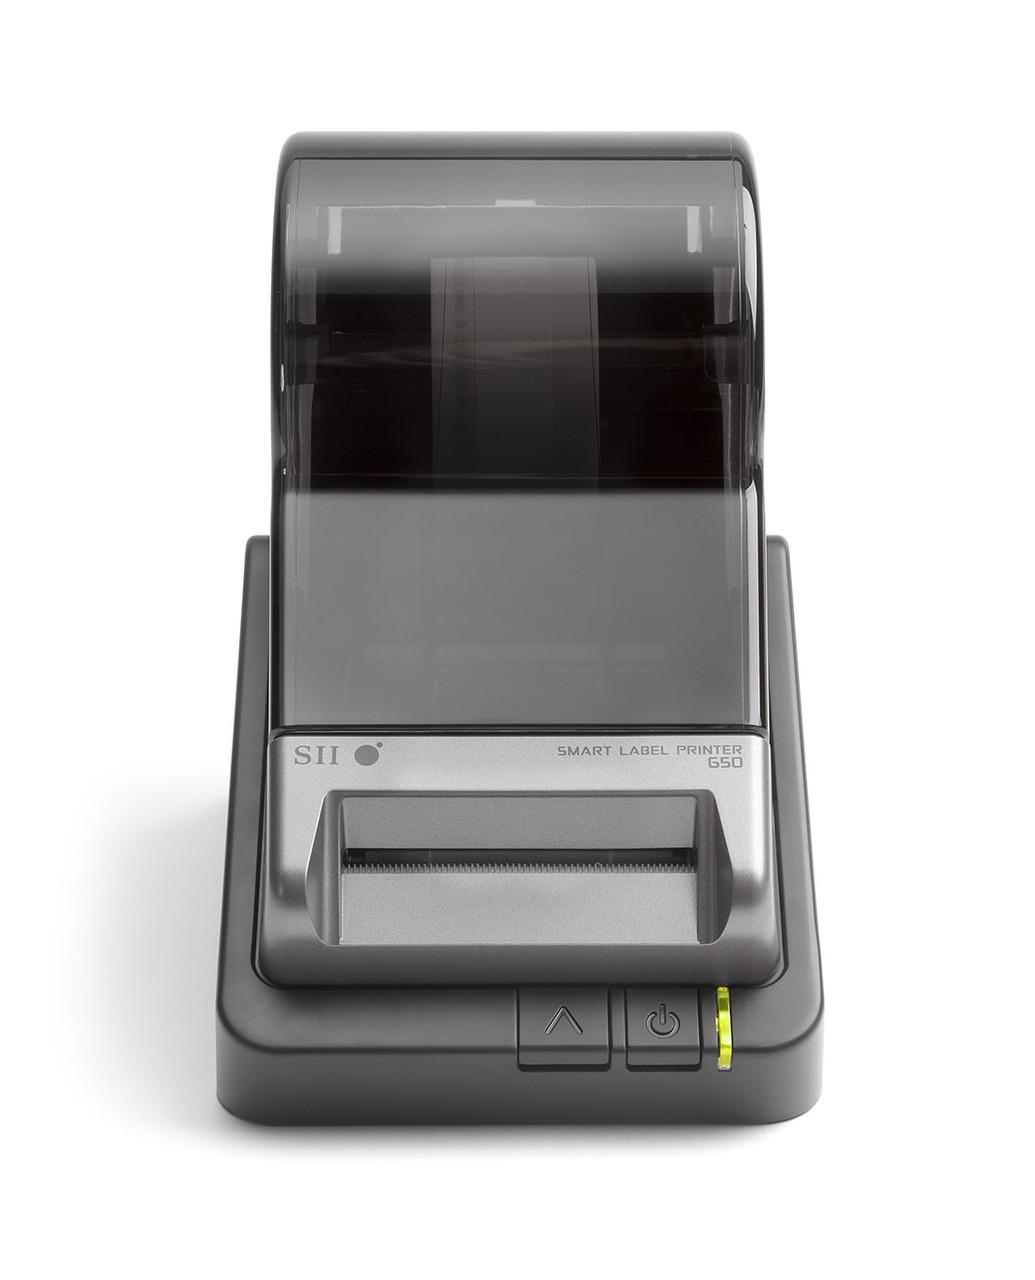 Seiko Smart Label Printer 650 [SLP 650]